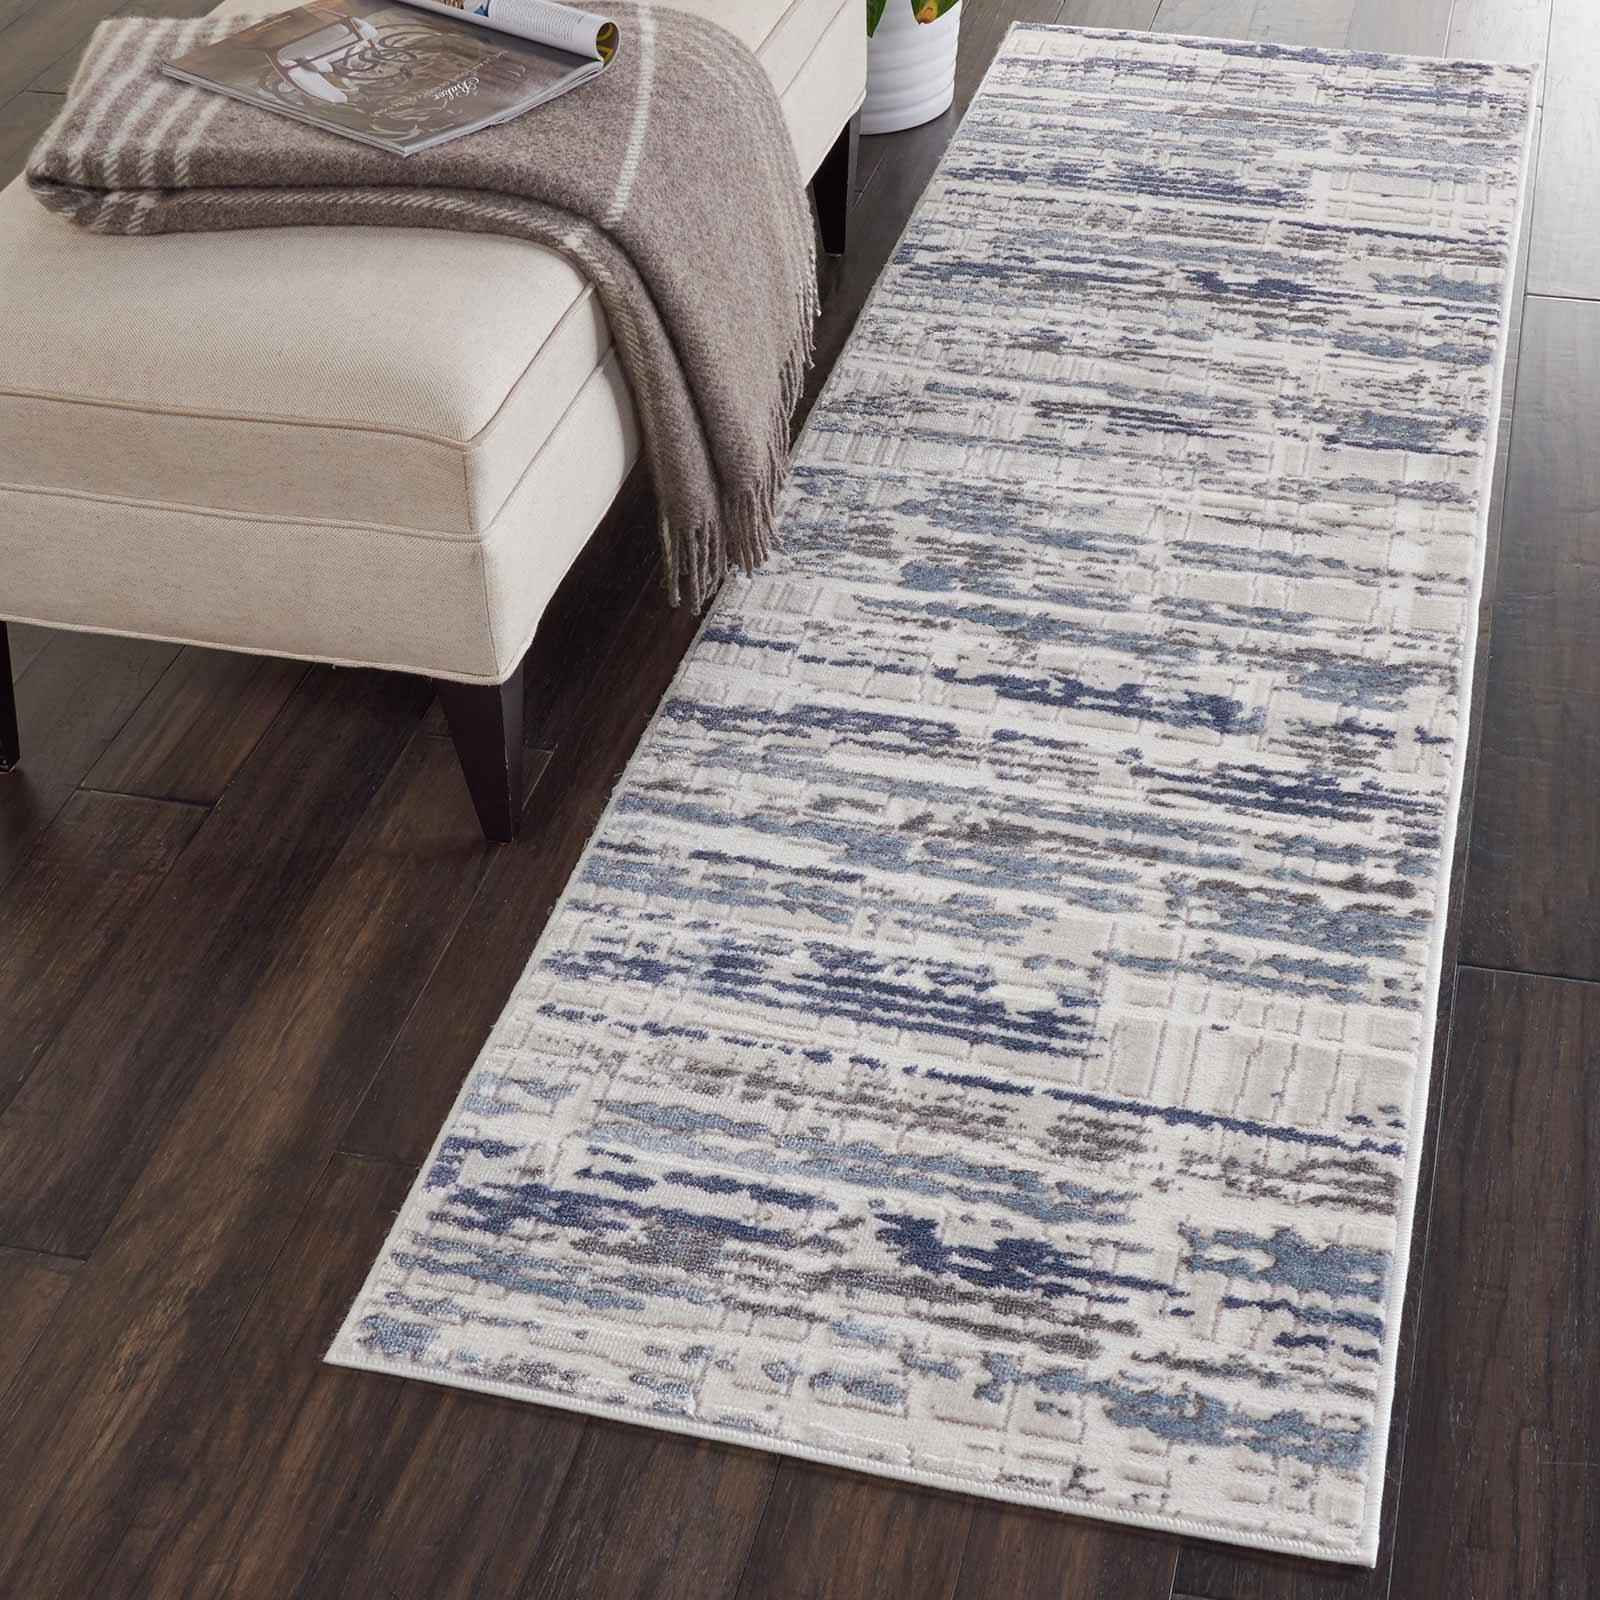 Nourison rug Urban Decor URD03 IVSLT 2X8 099446143570 interior 1 C